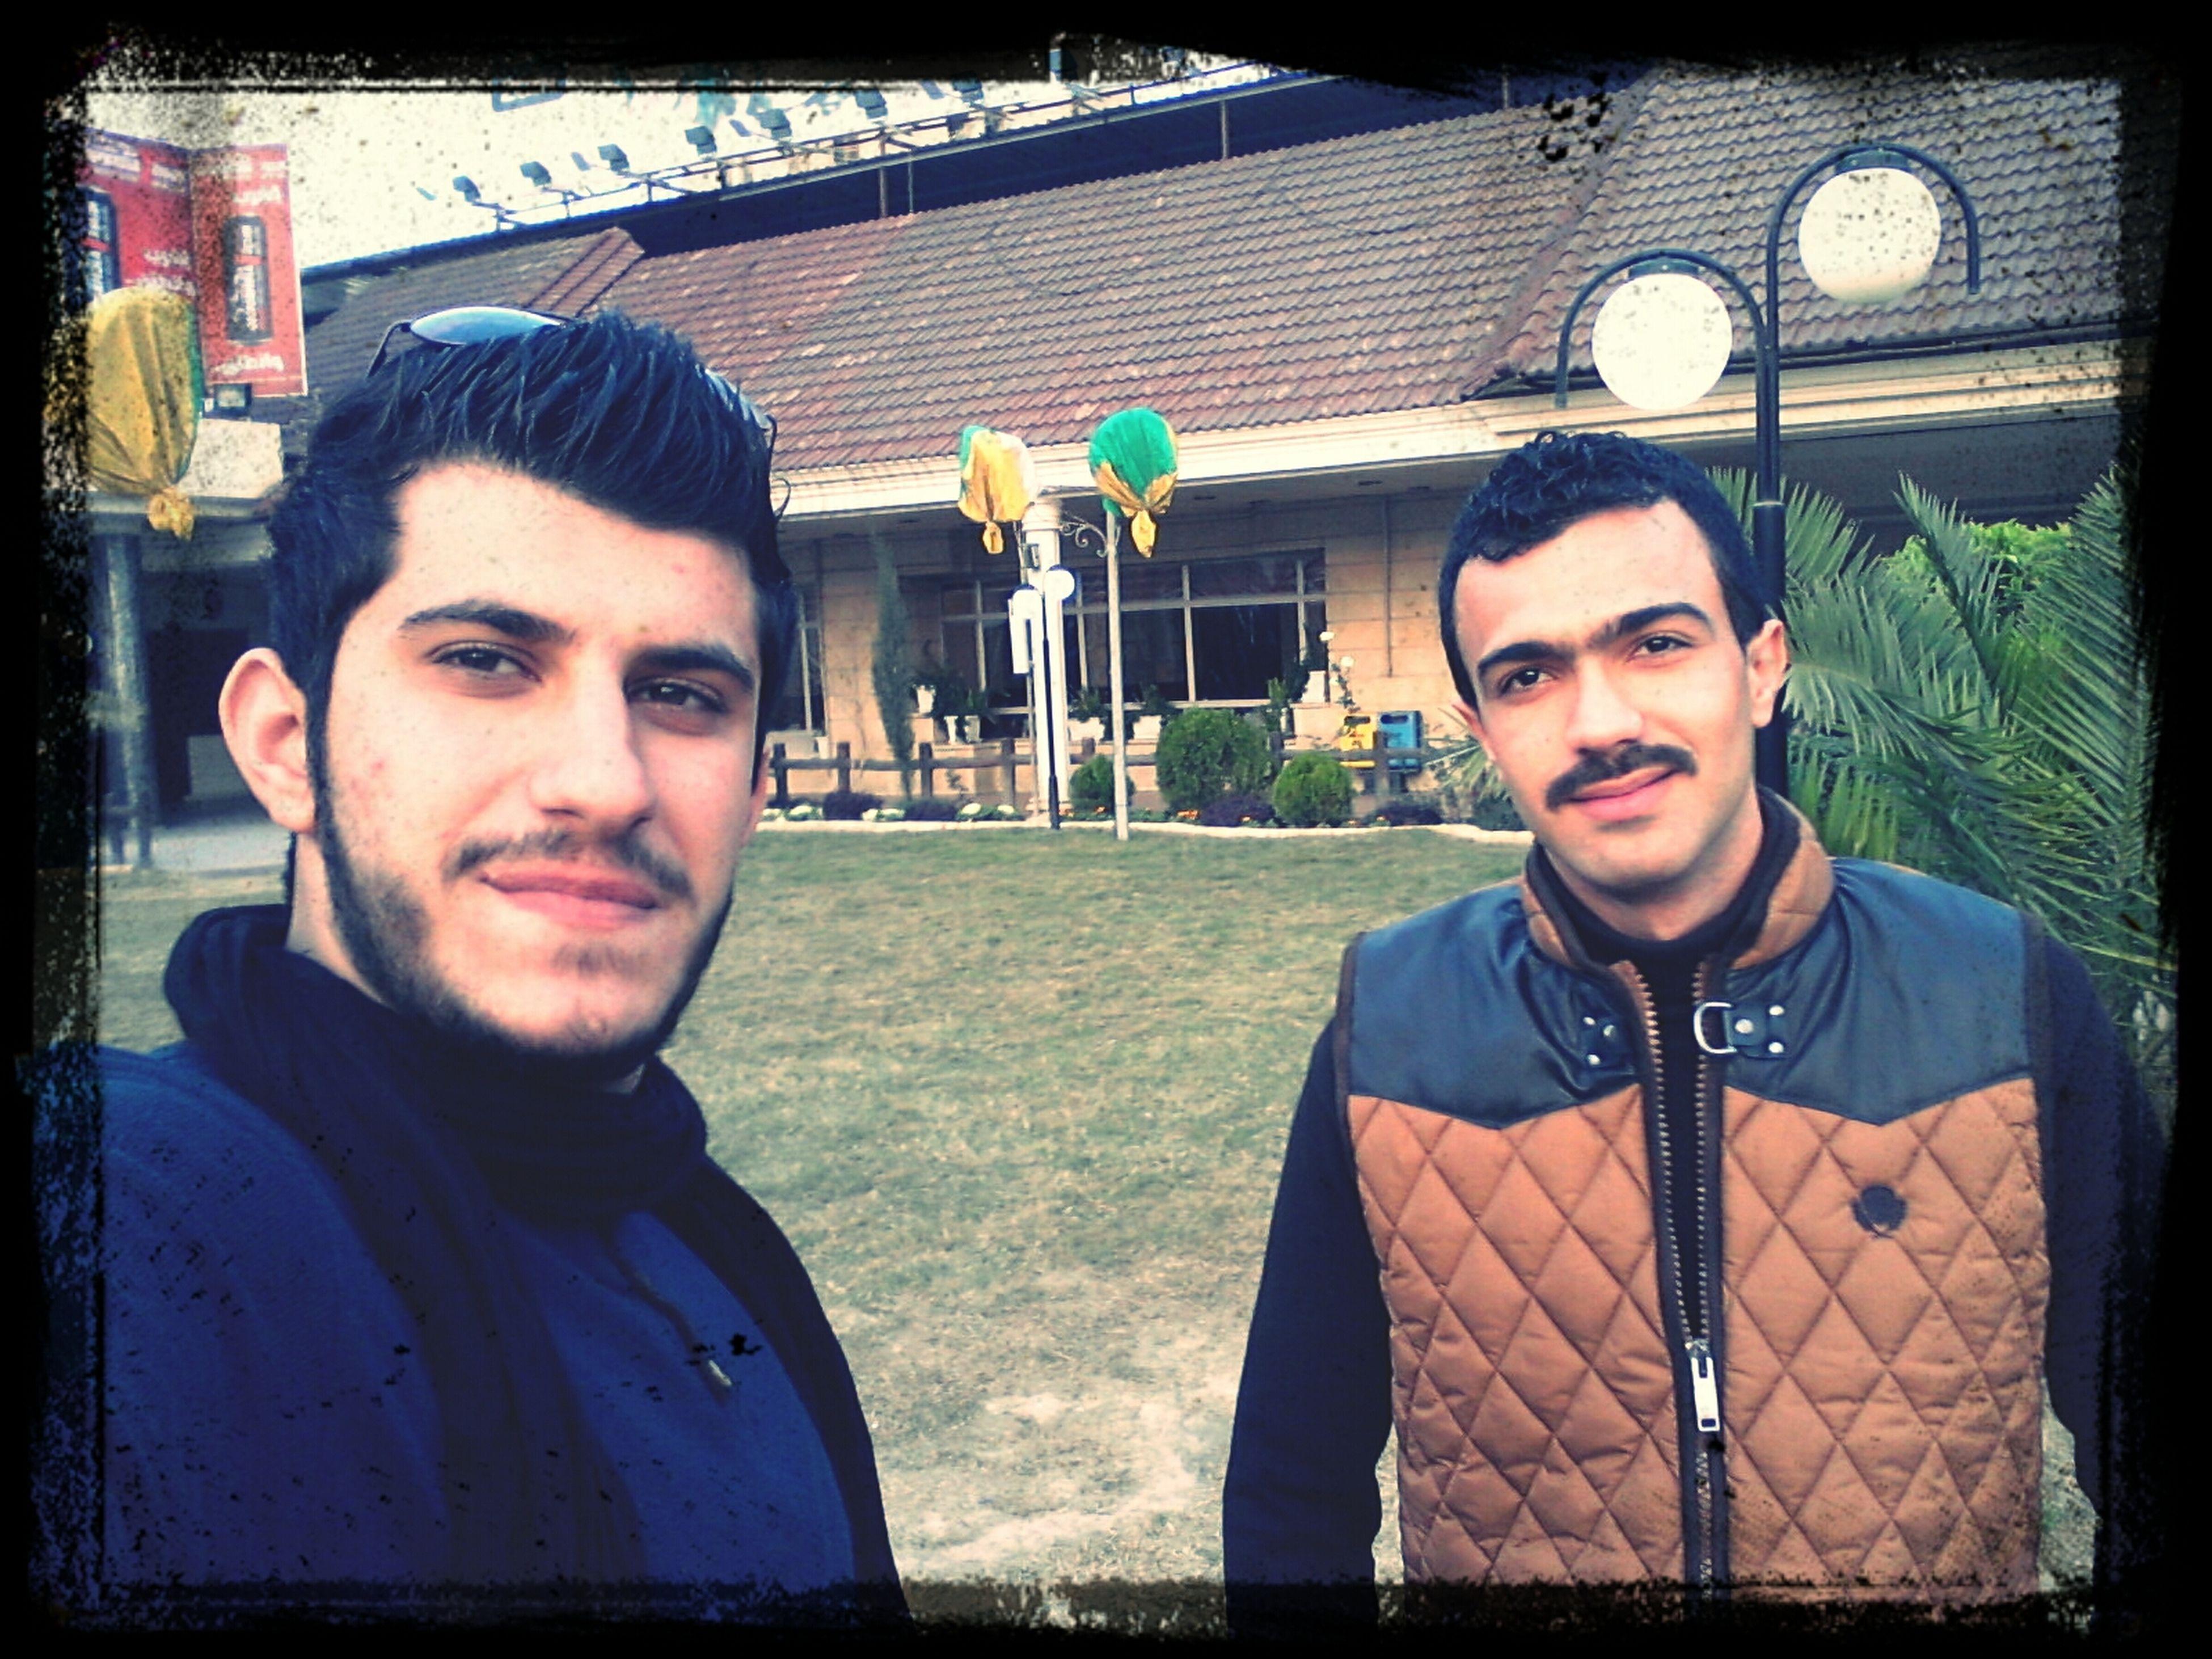 me and protanent mohammad Al_elwia Clib Karadah Hanging Out